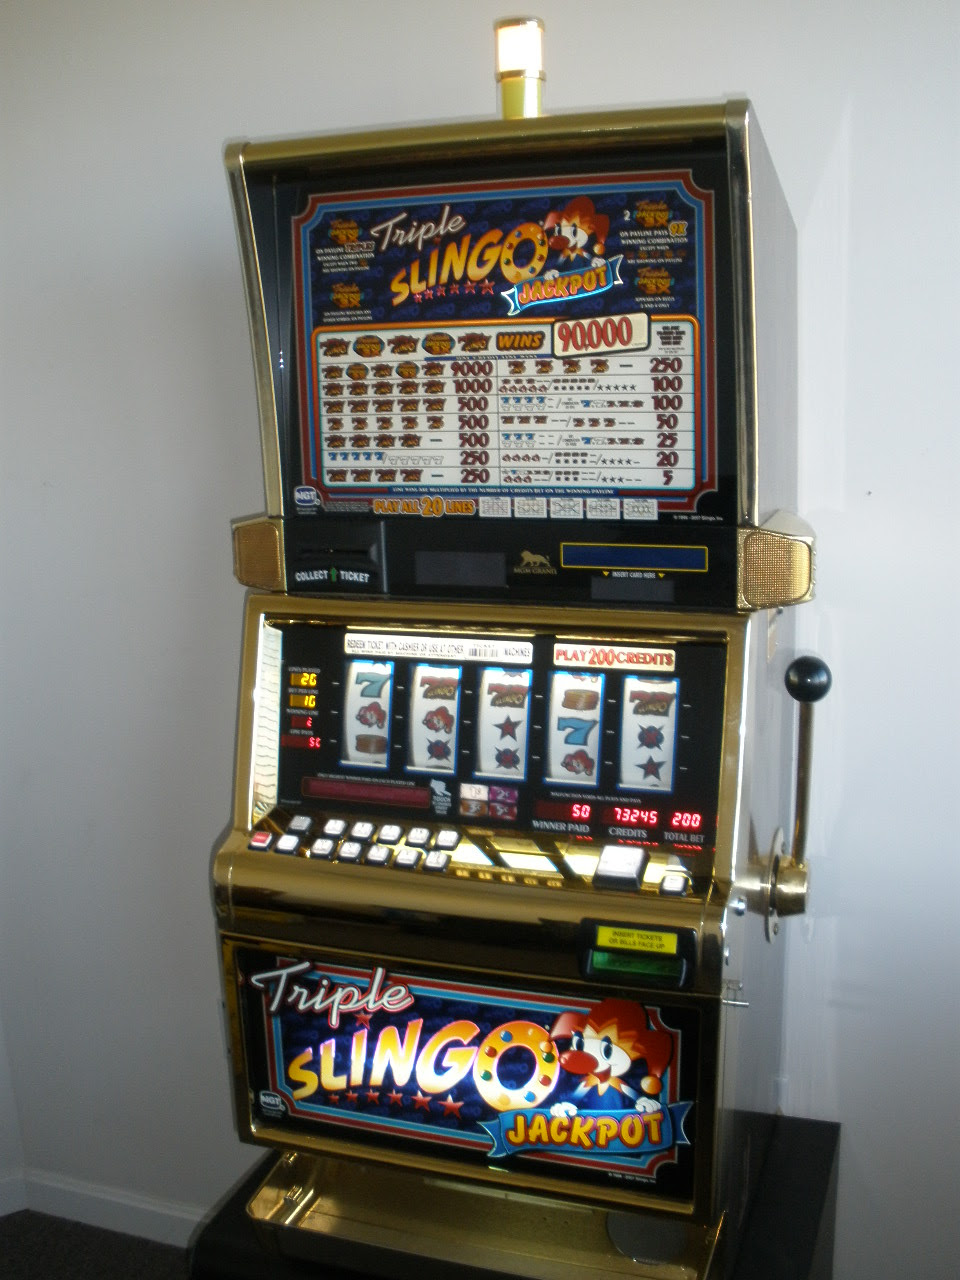 Best Slot Machine Handheld Casino Games Reviews: Top Picks For